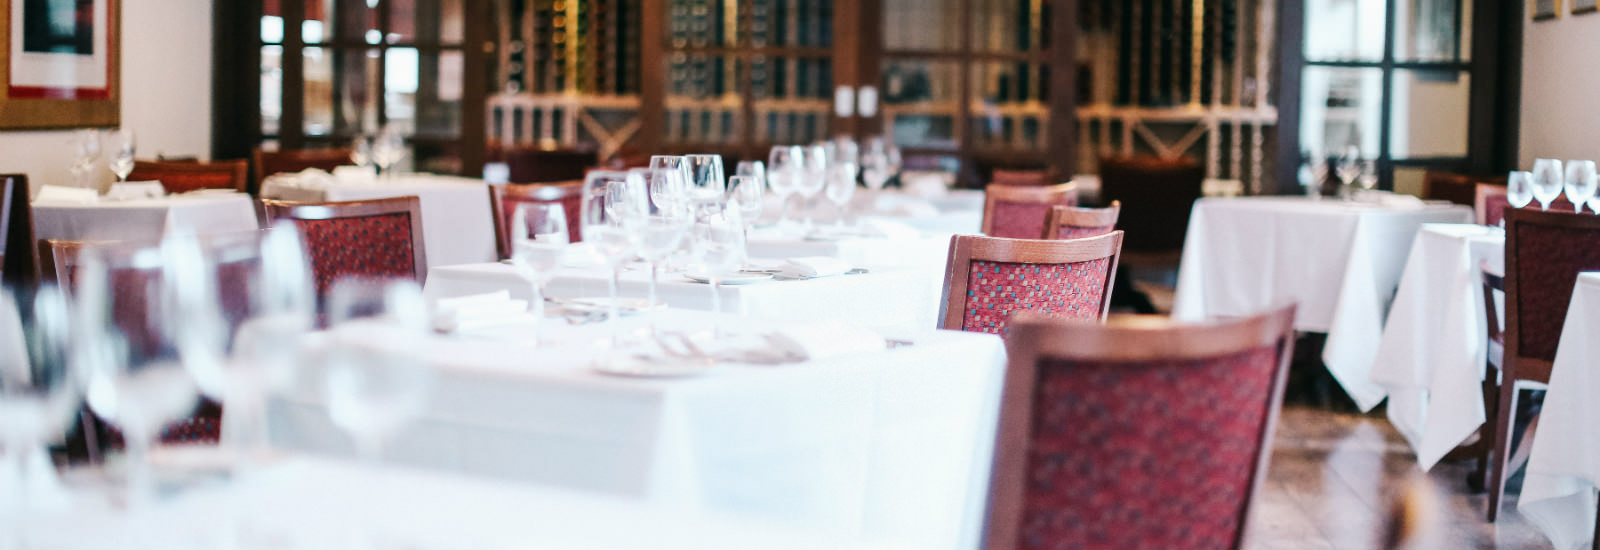 Brace Restaurant at Raithwaite Estate dining layout